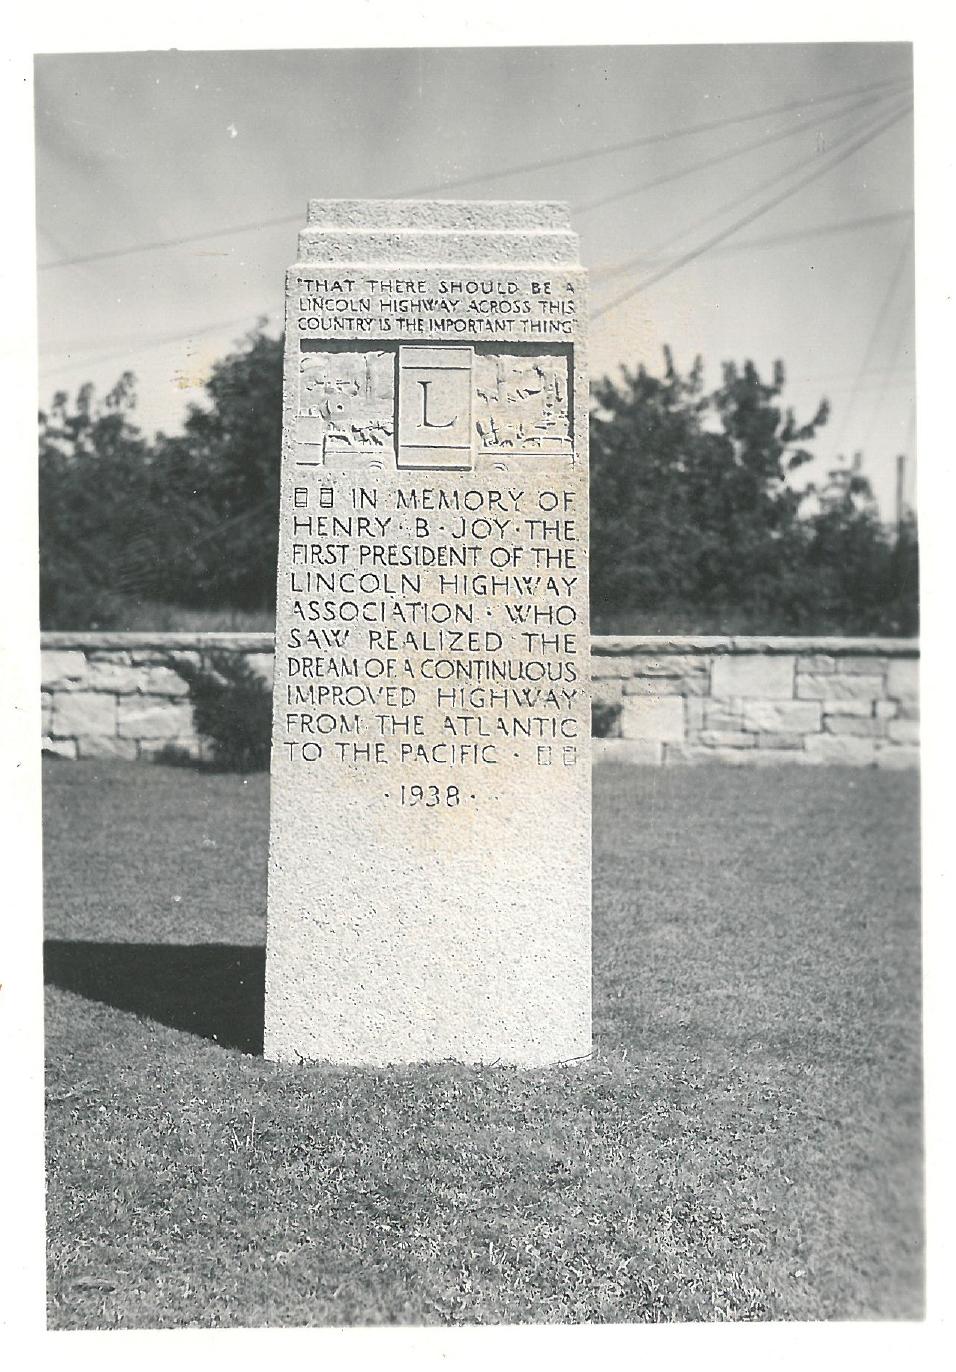 HBJ Monument